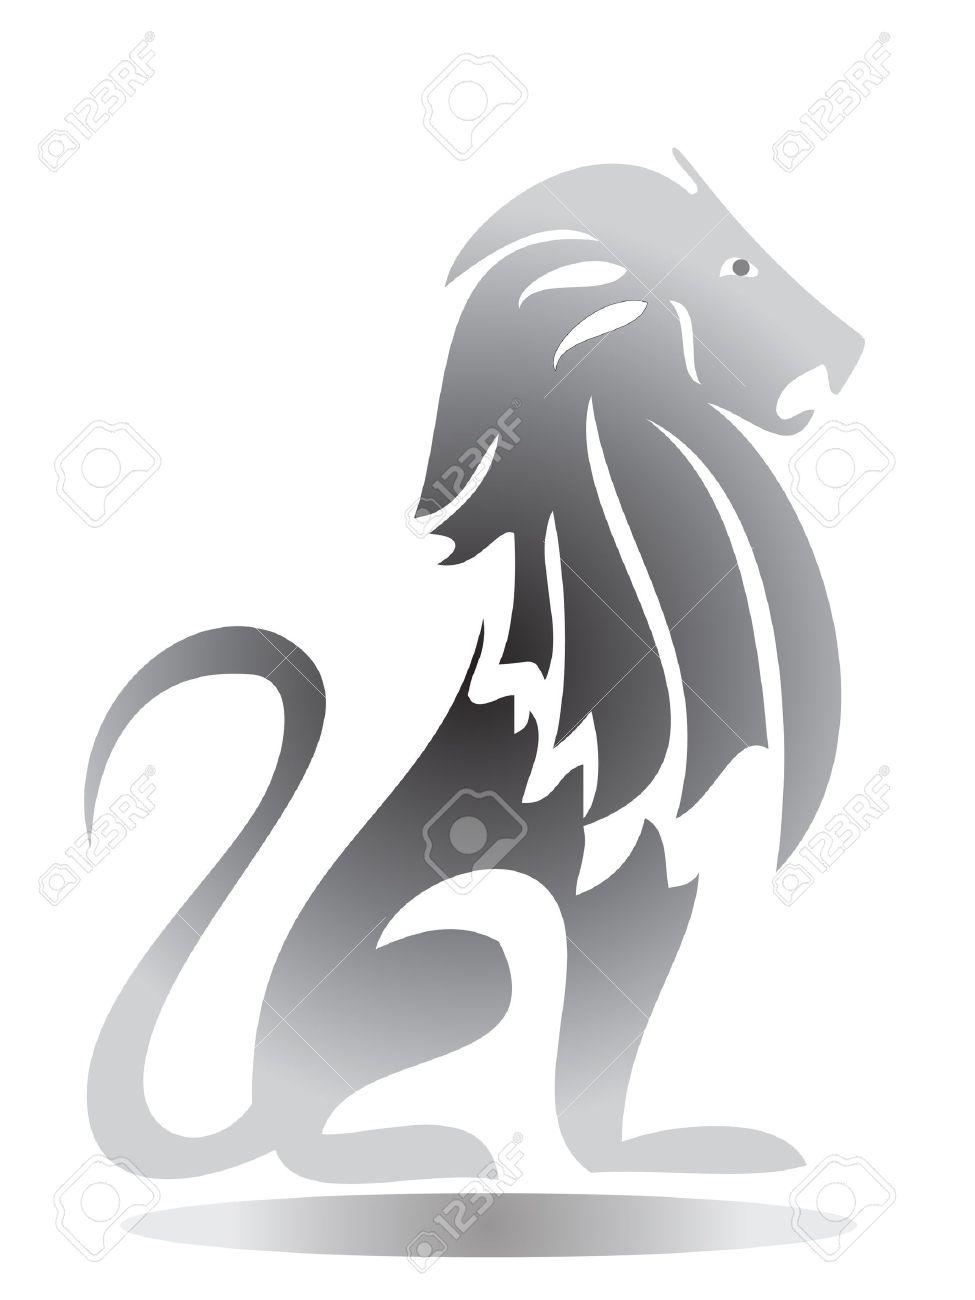 Lion Silhouette Stock Vector - 10599266